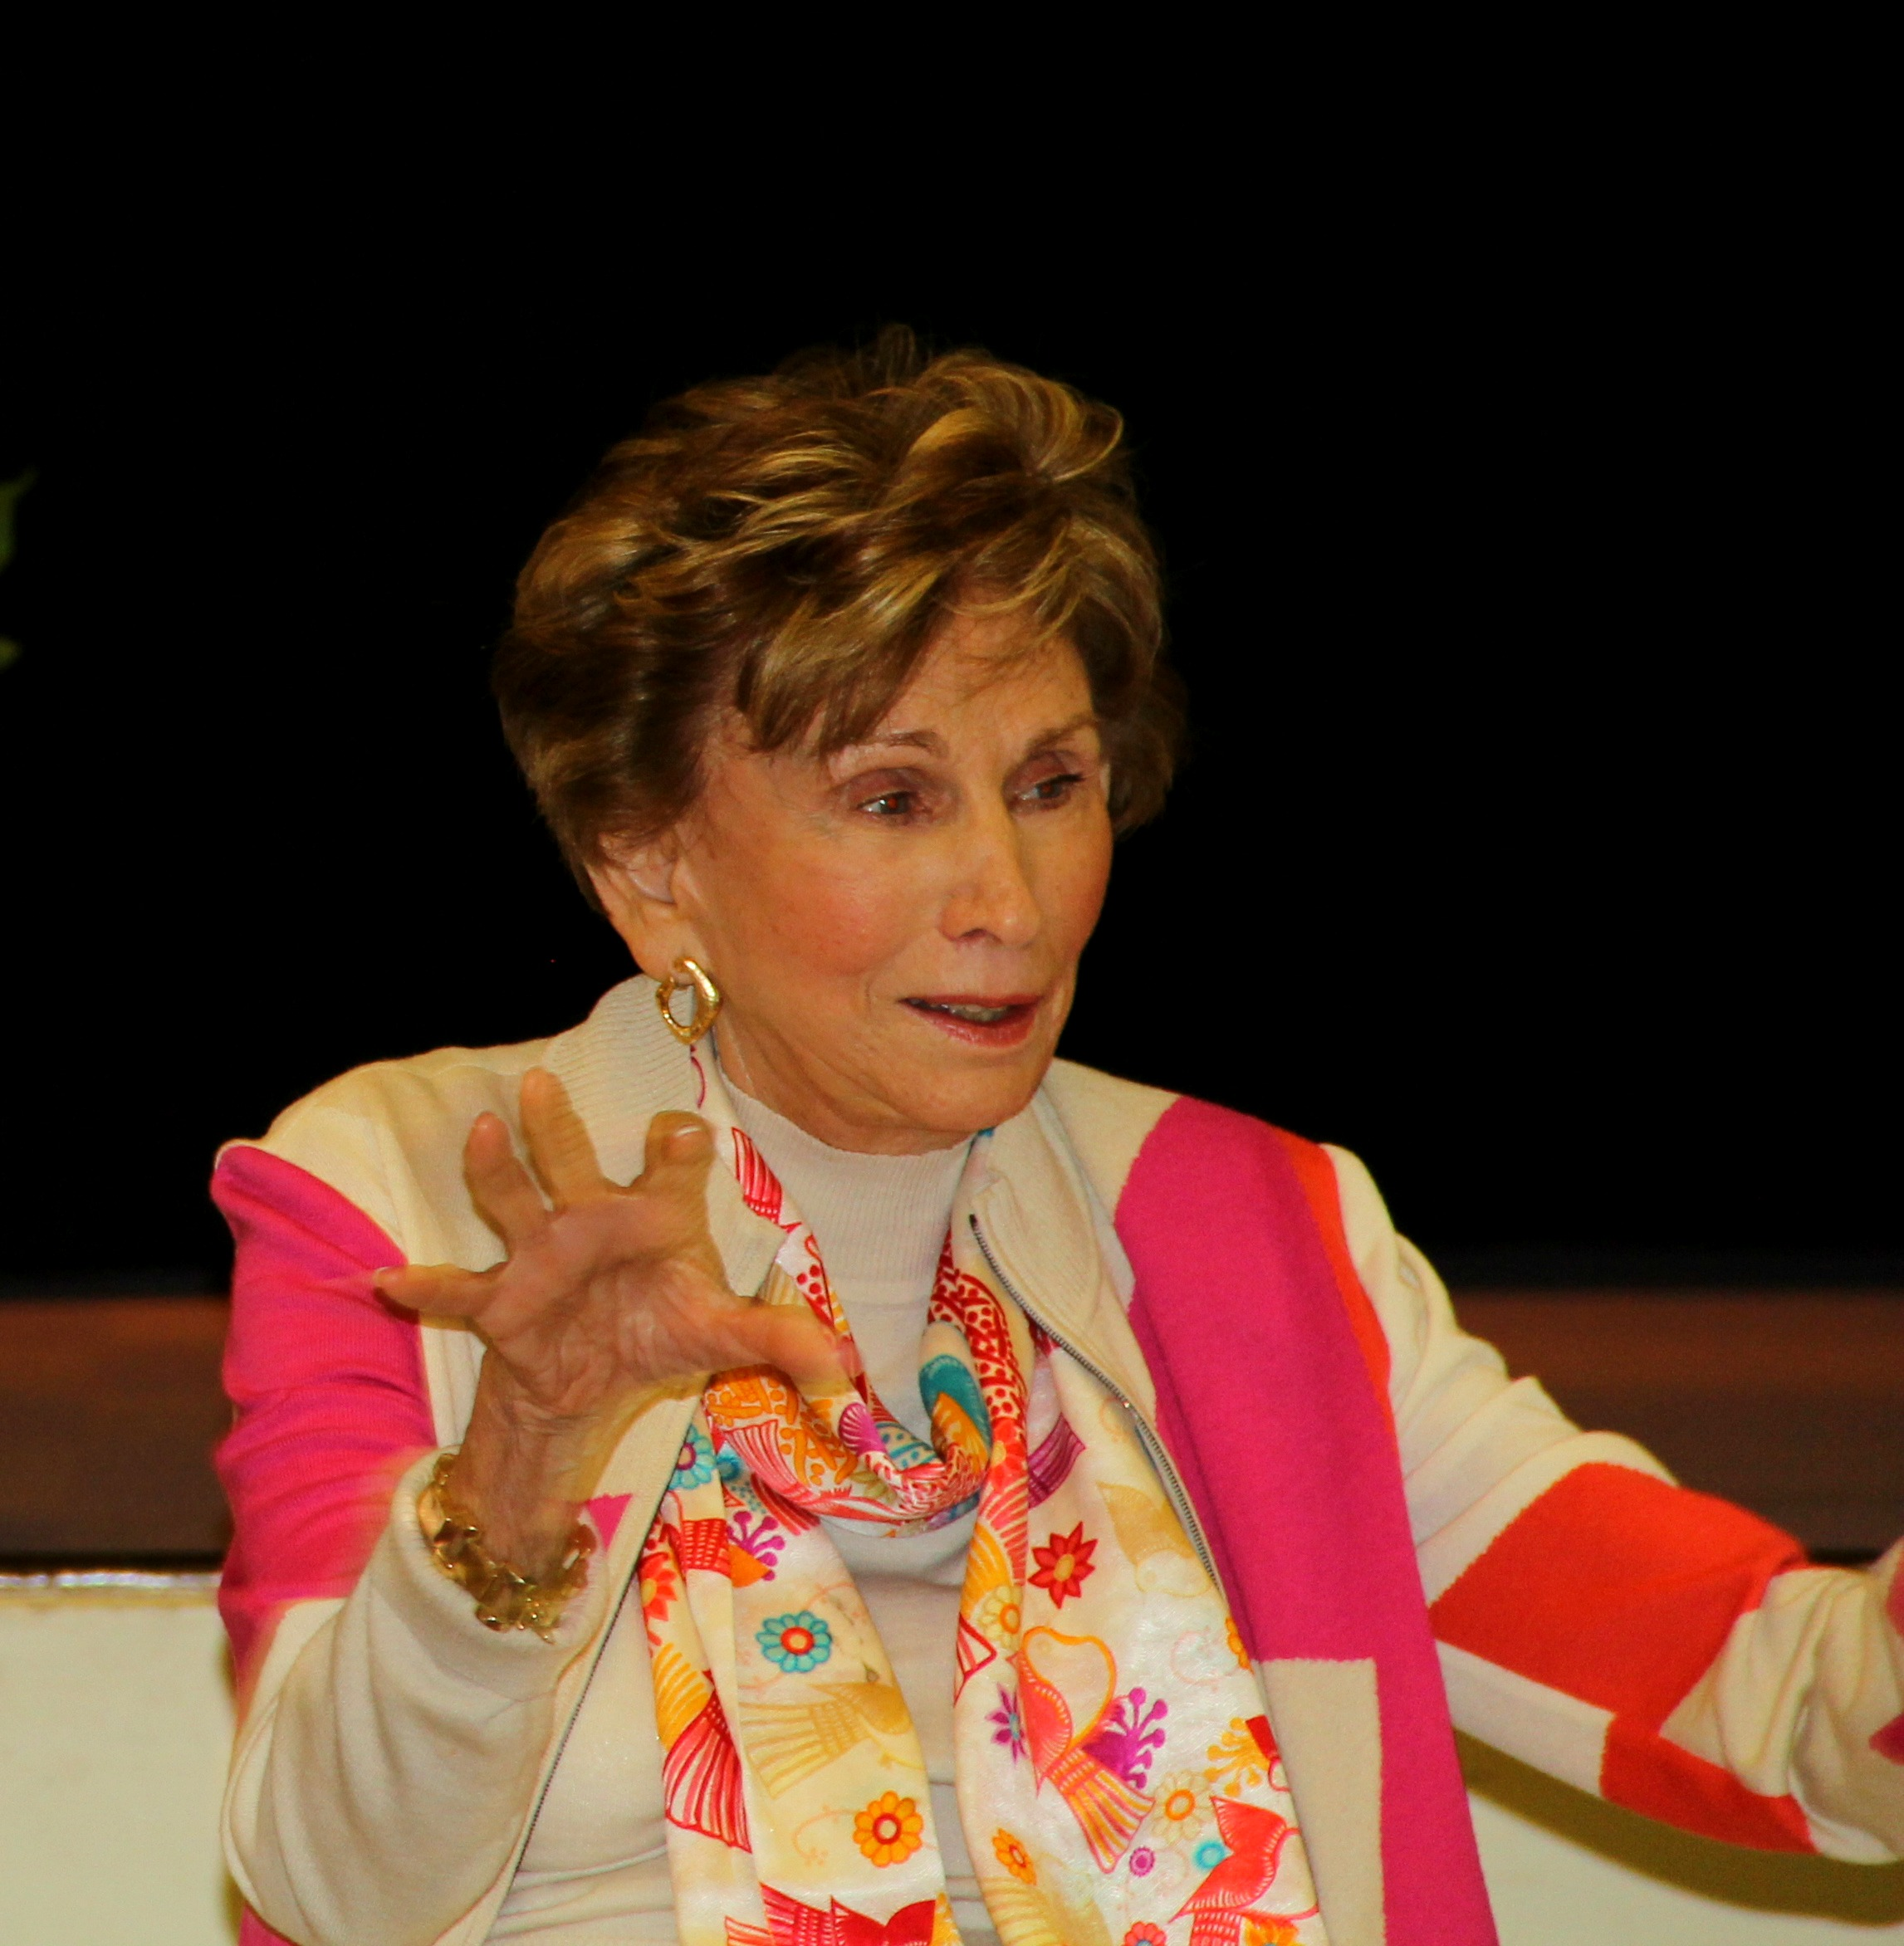 Dr. Edith Eger picmonkey